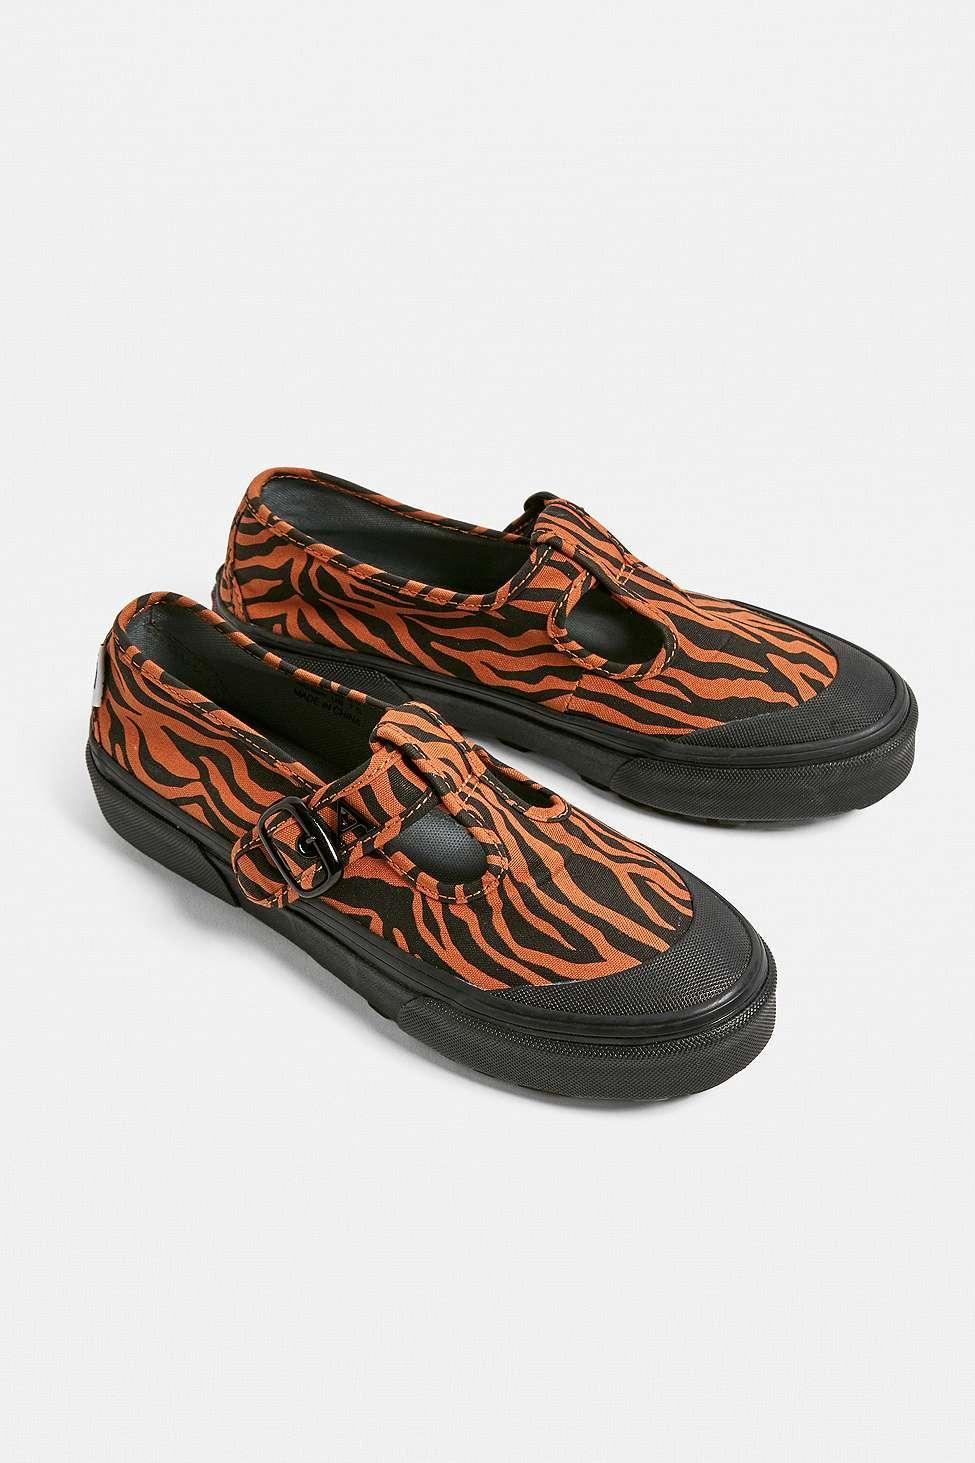 d7d17506df4 Vans - Black X Ashley Williams Ua 93 Tiger Print Mary Jane Trainers - Lyst.  View fullscreen